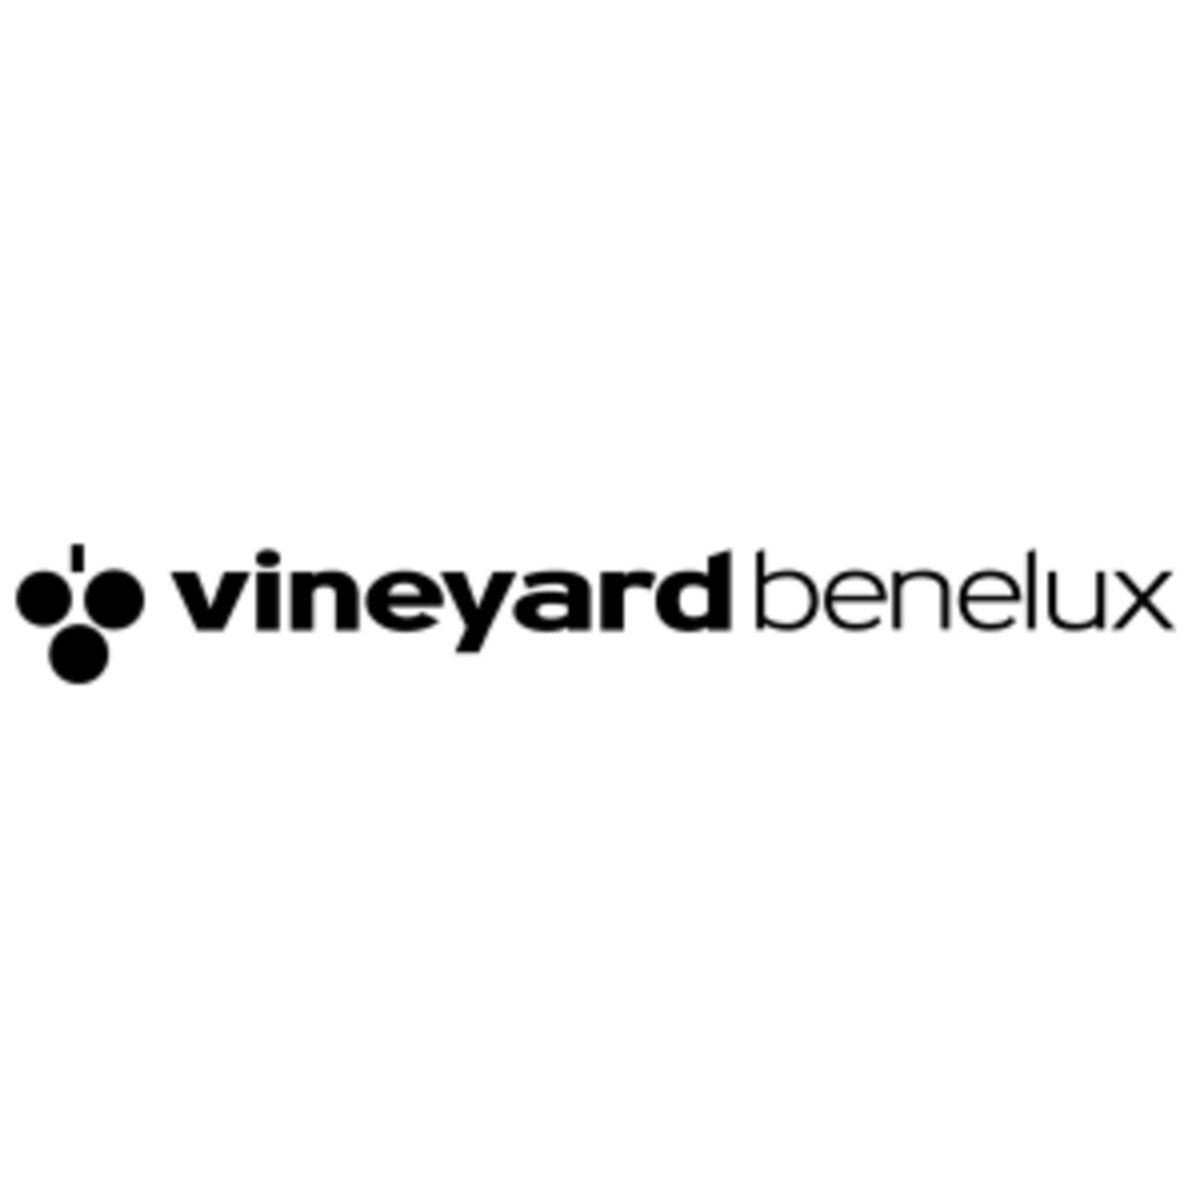 Vineyard Benelux